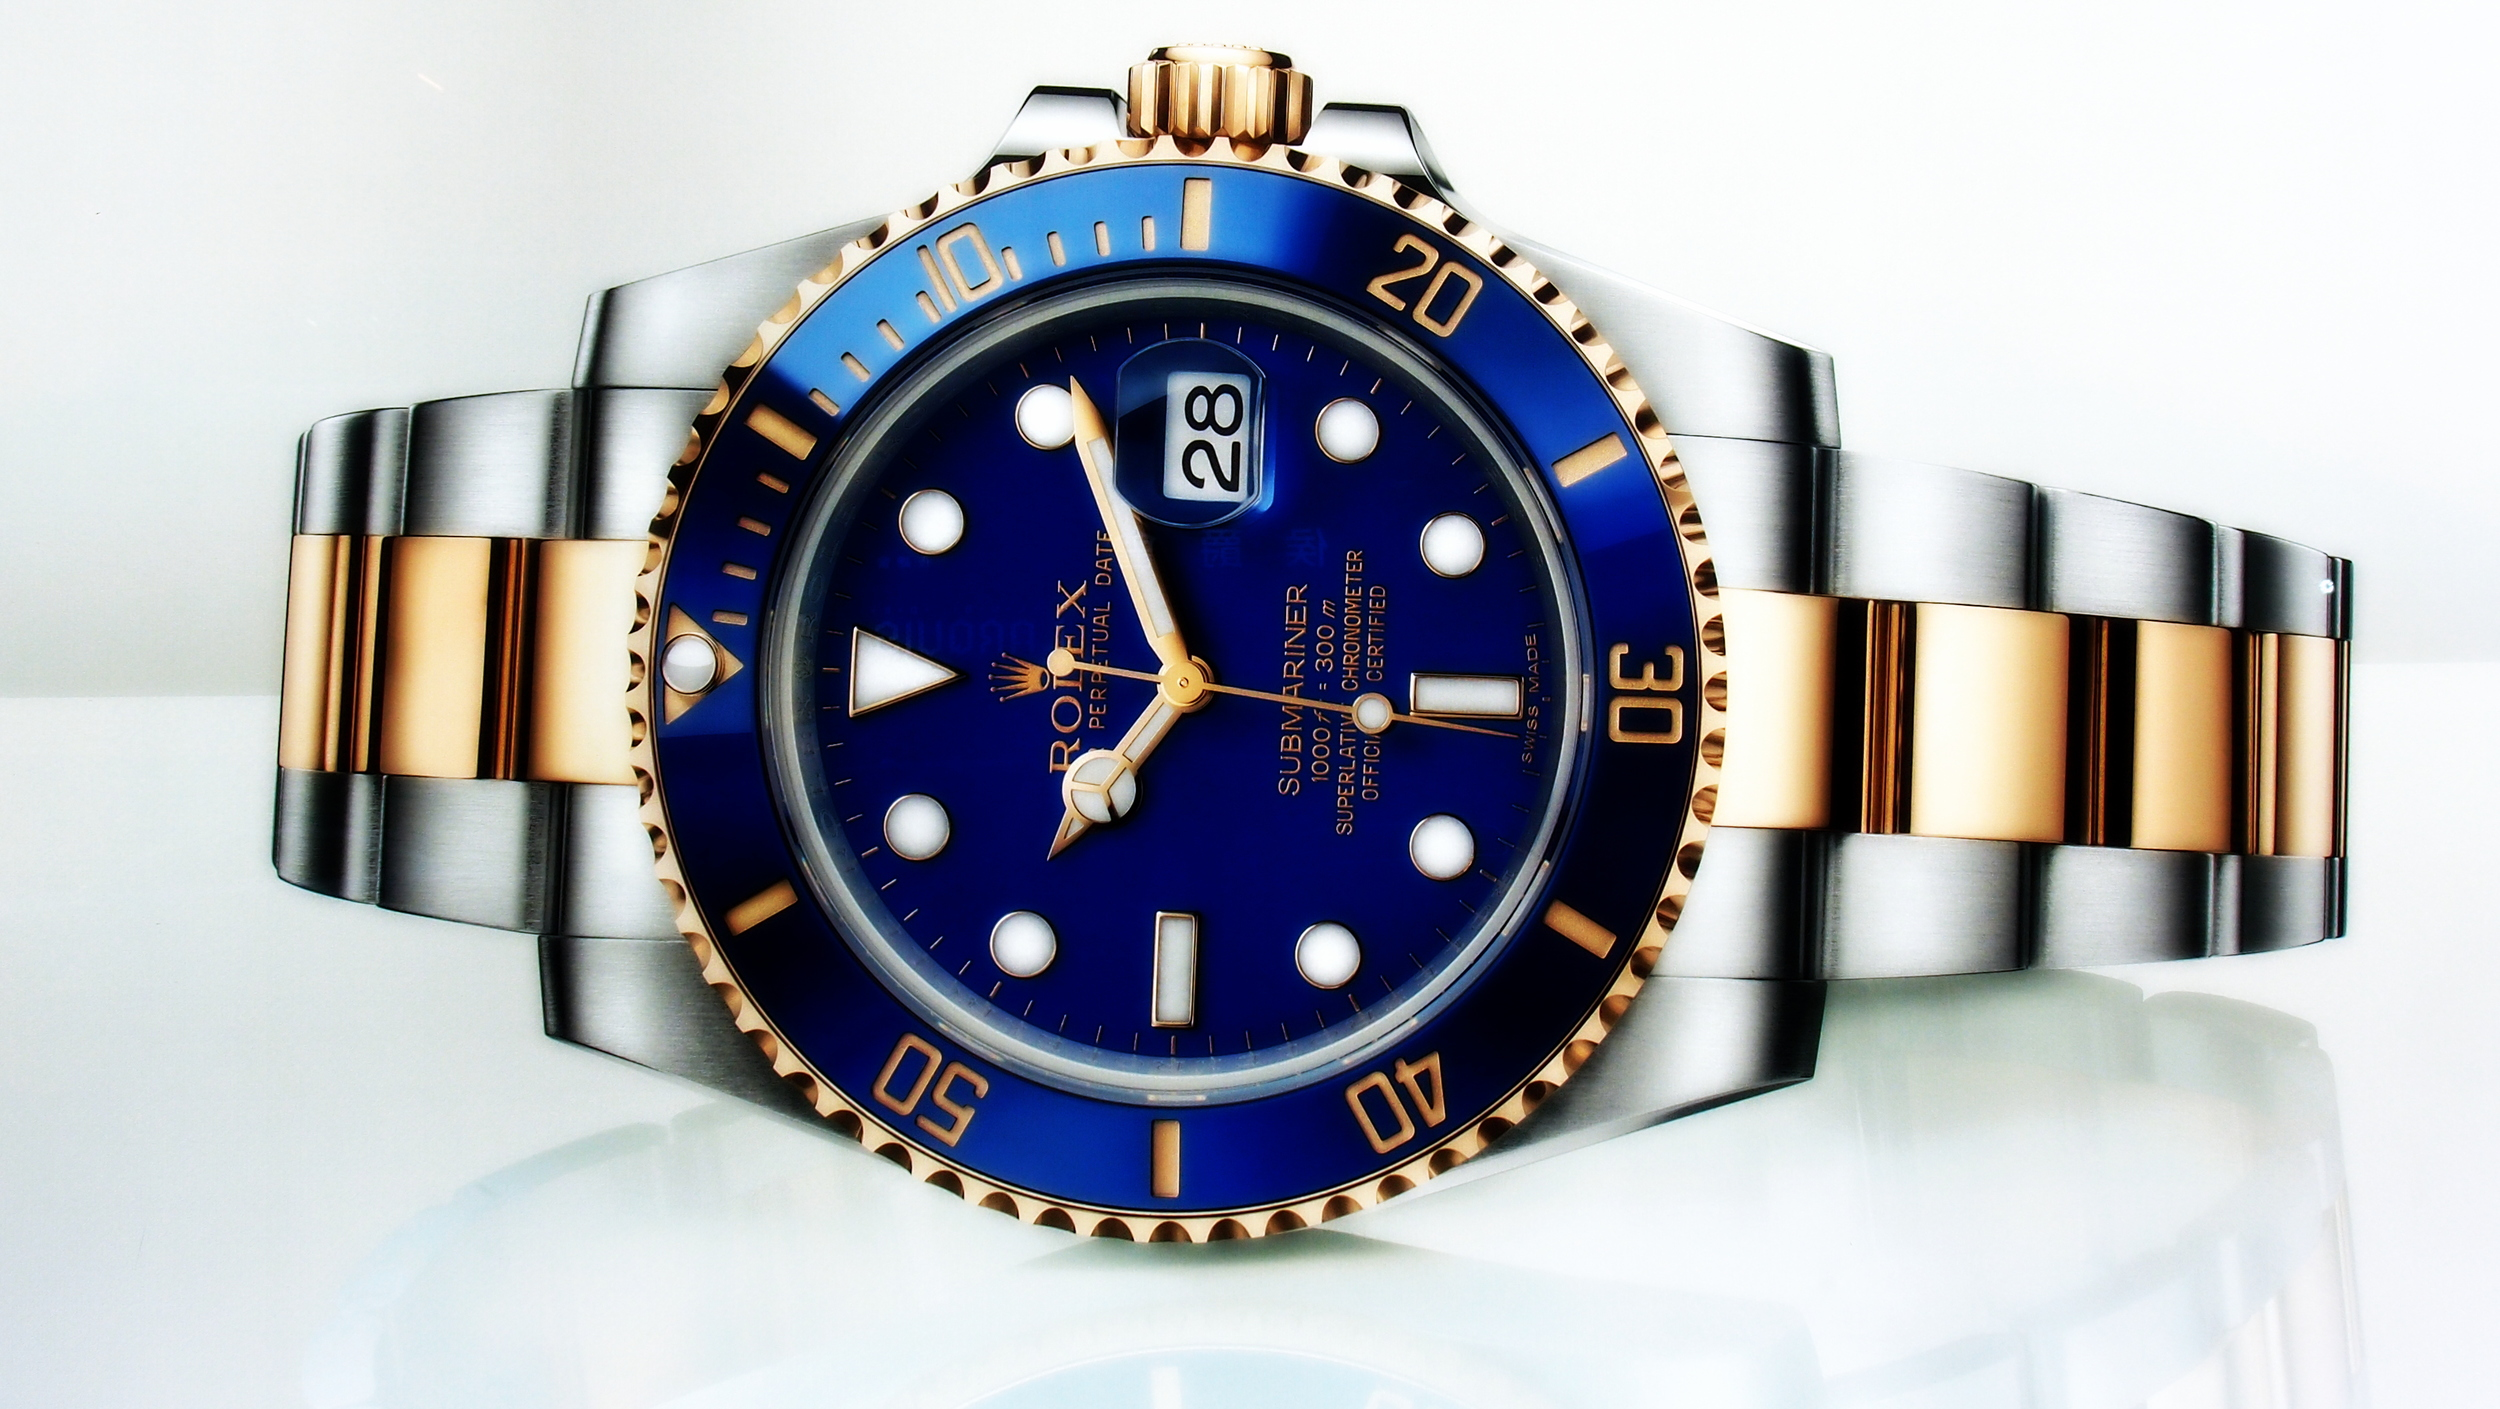 Perhaps my favourite Rolex watch